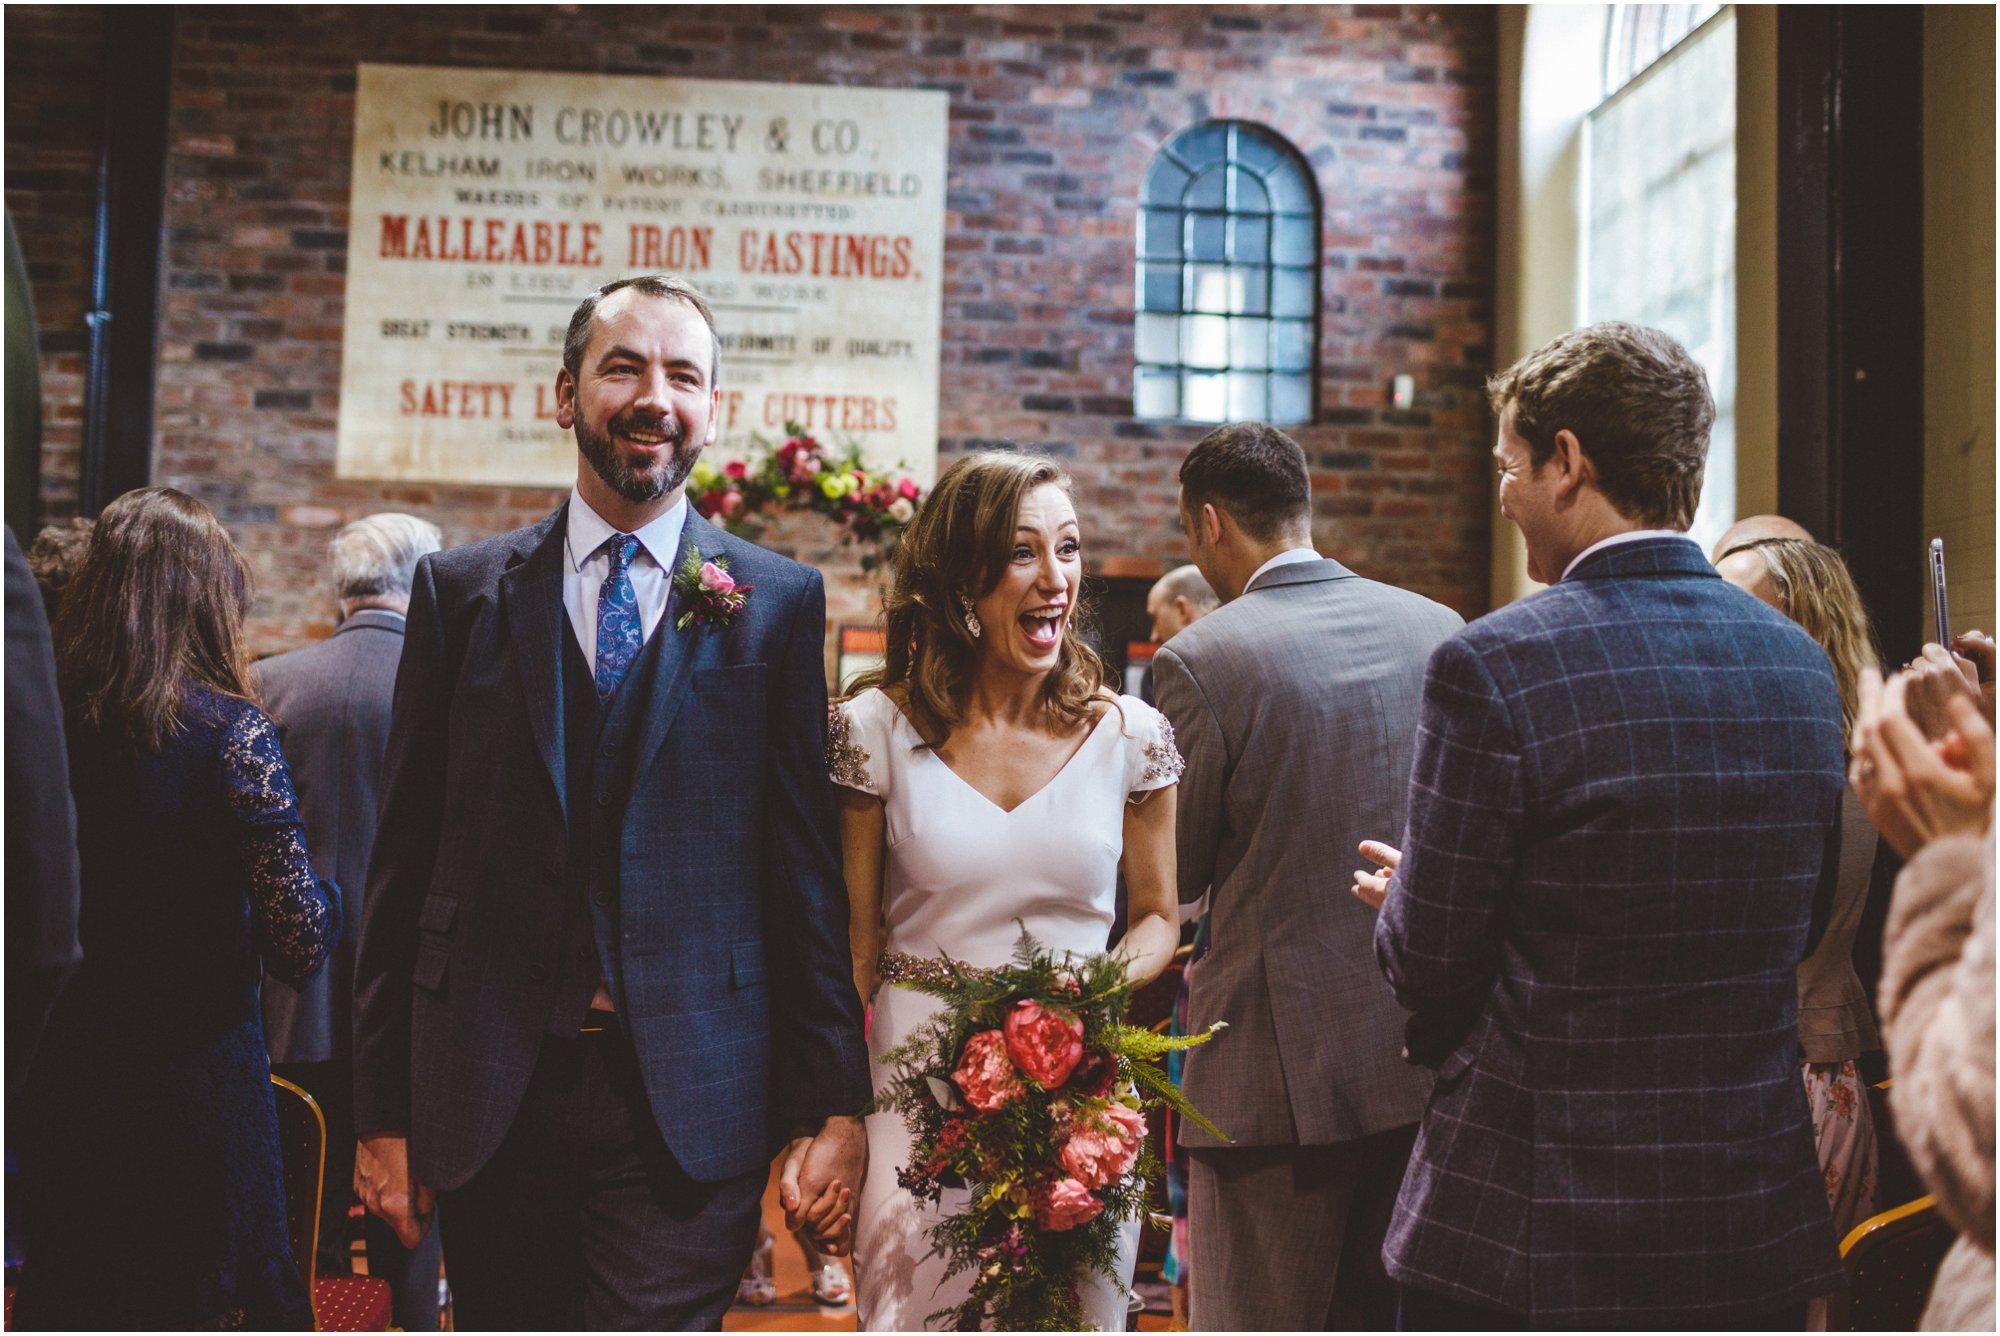 sheffield-wedding-photographer_0073.jpg